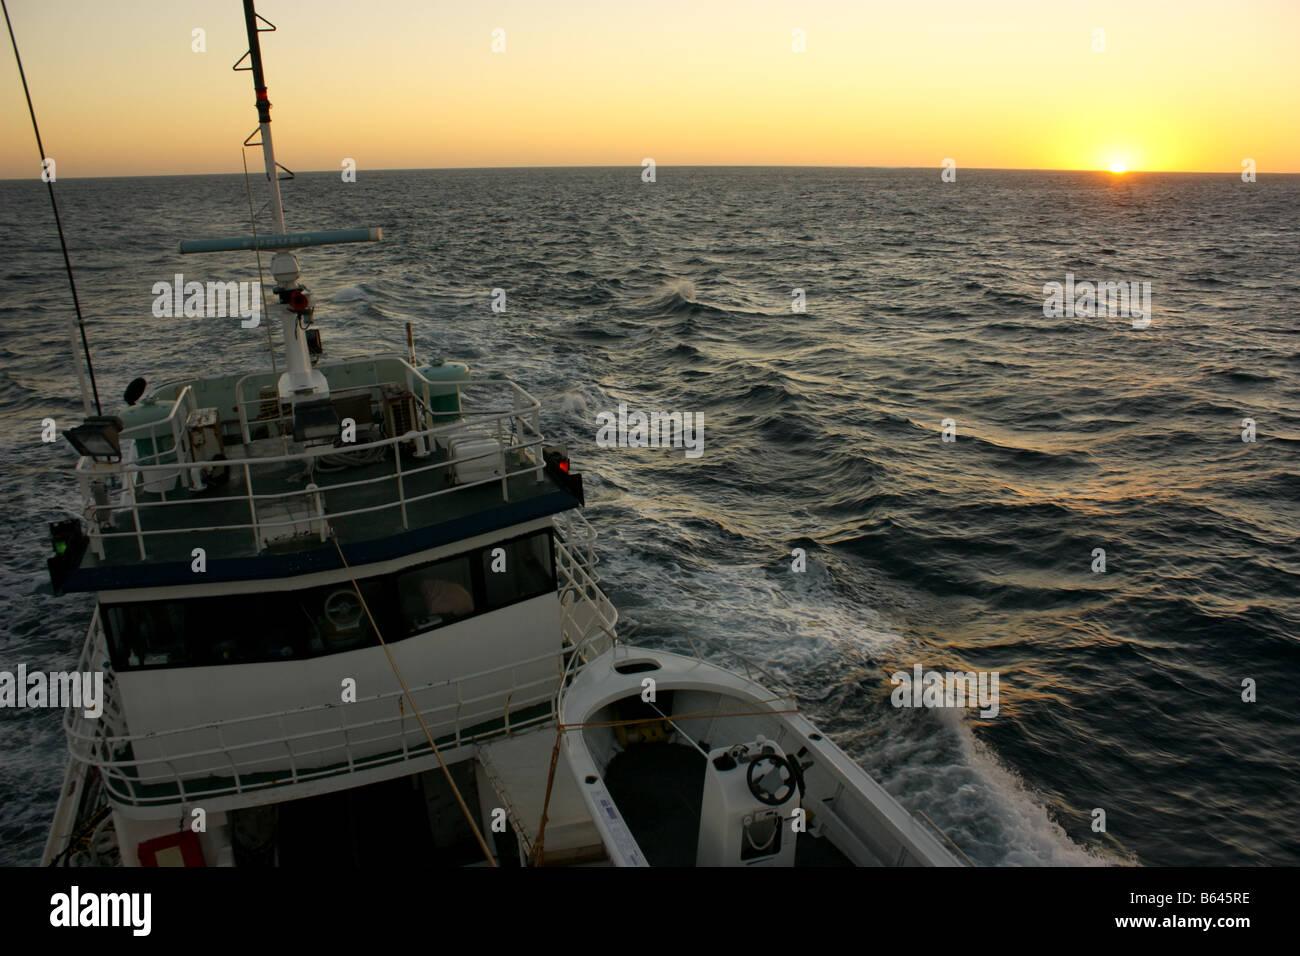 Crab fishing boat stock photos crab fishing boat stock for Deep sea fishing half moon bay